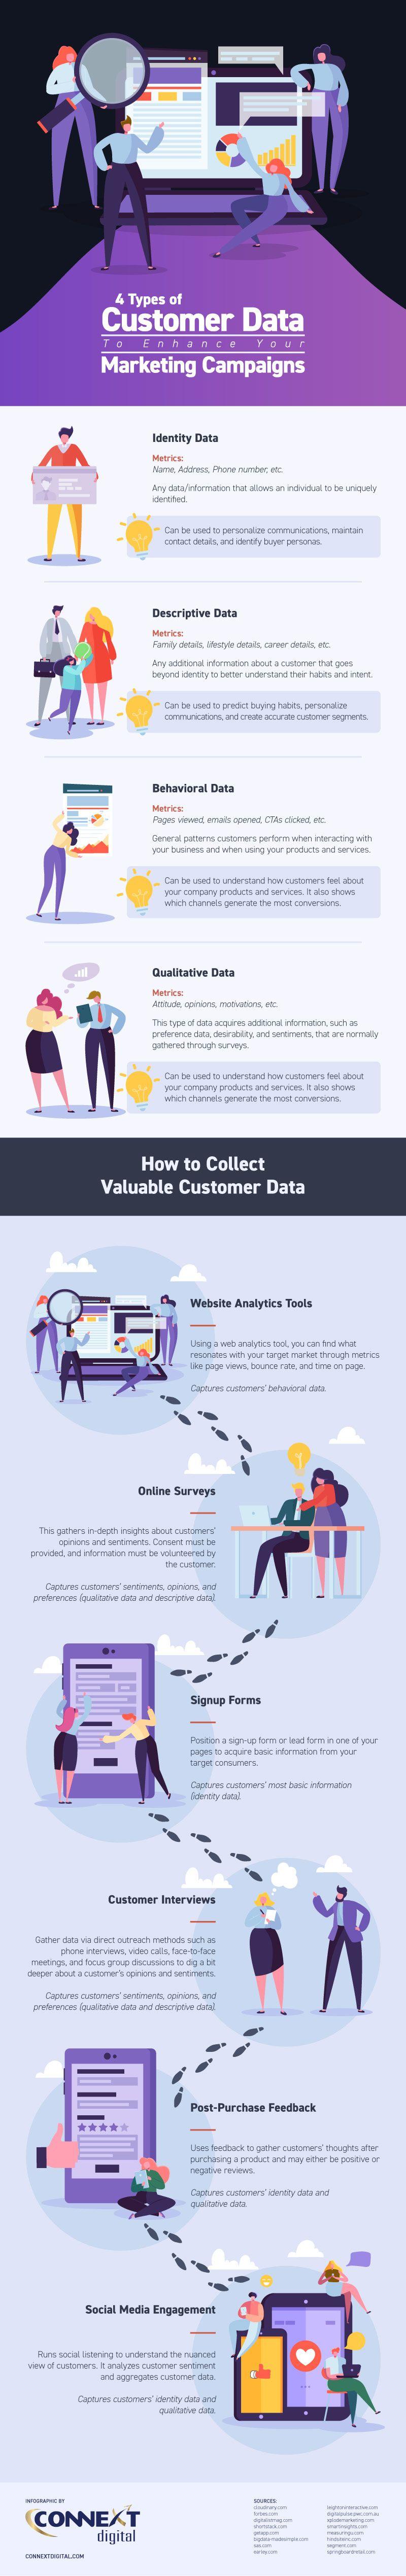 types of customer data for marketing